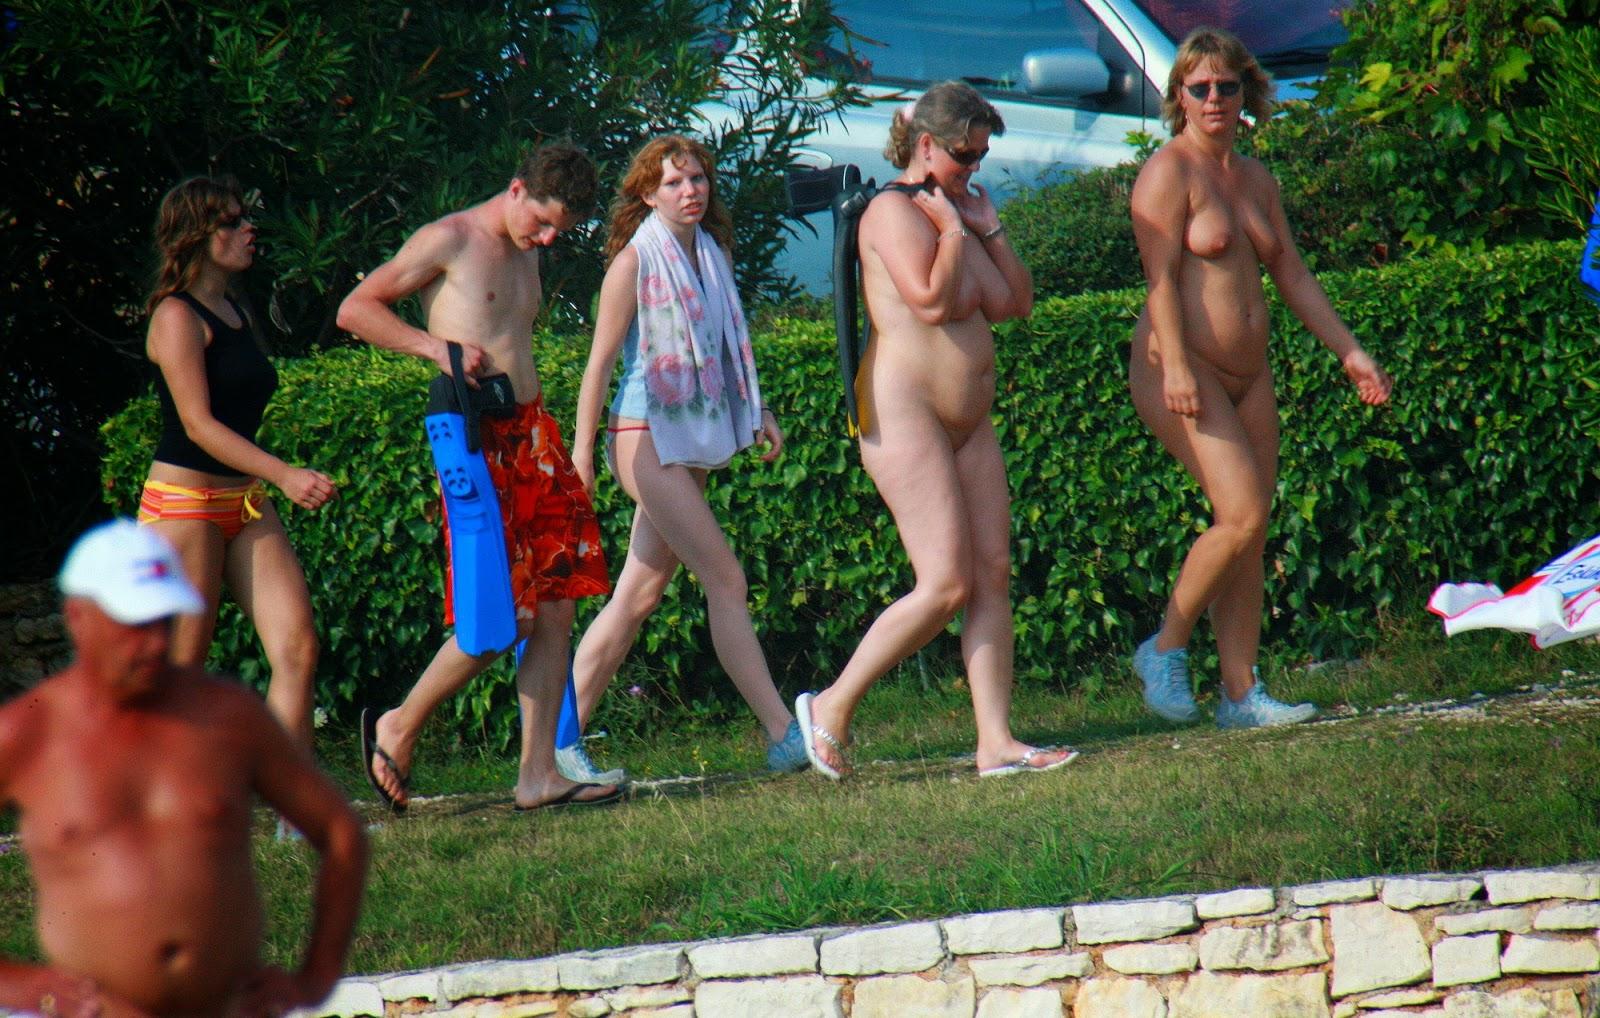 Group nude women